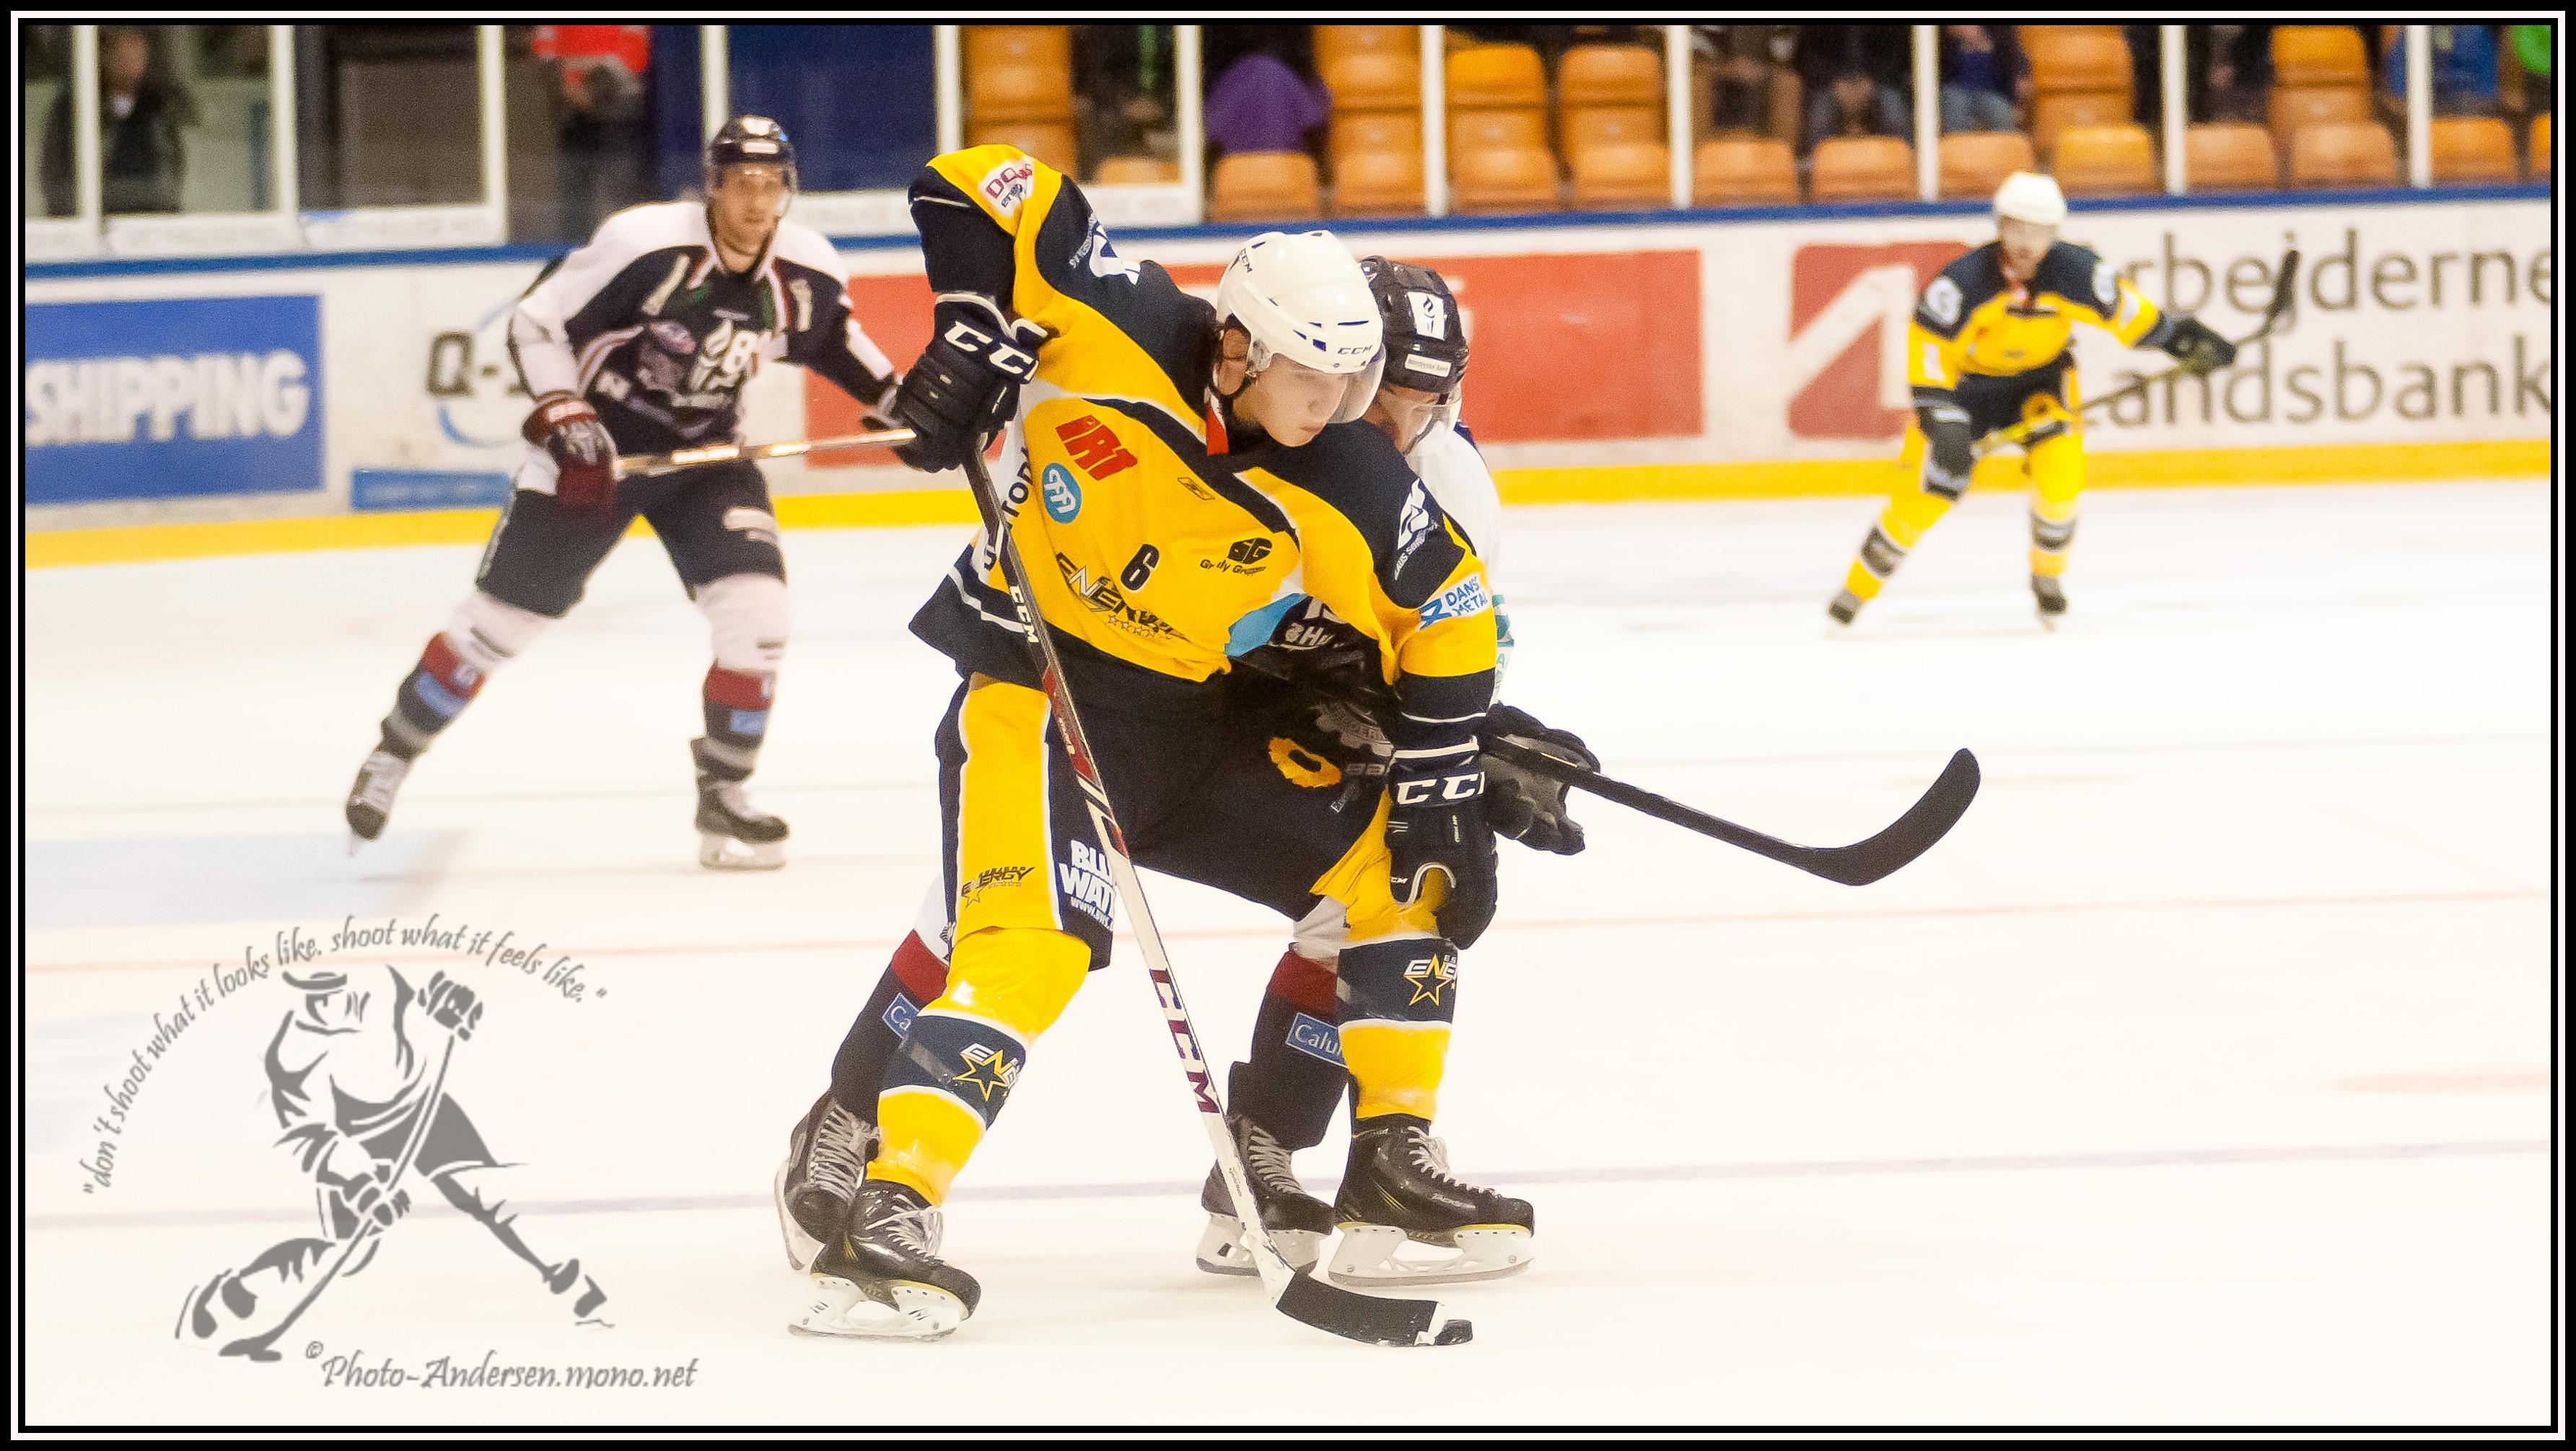 Elite Prospects - Andreas B  Pedersen Photo Gallery